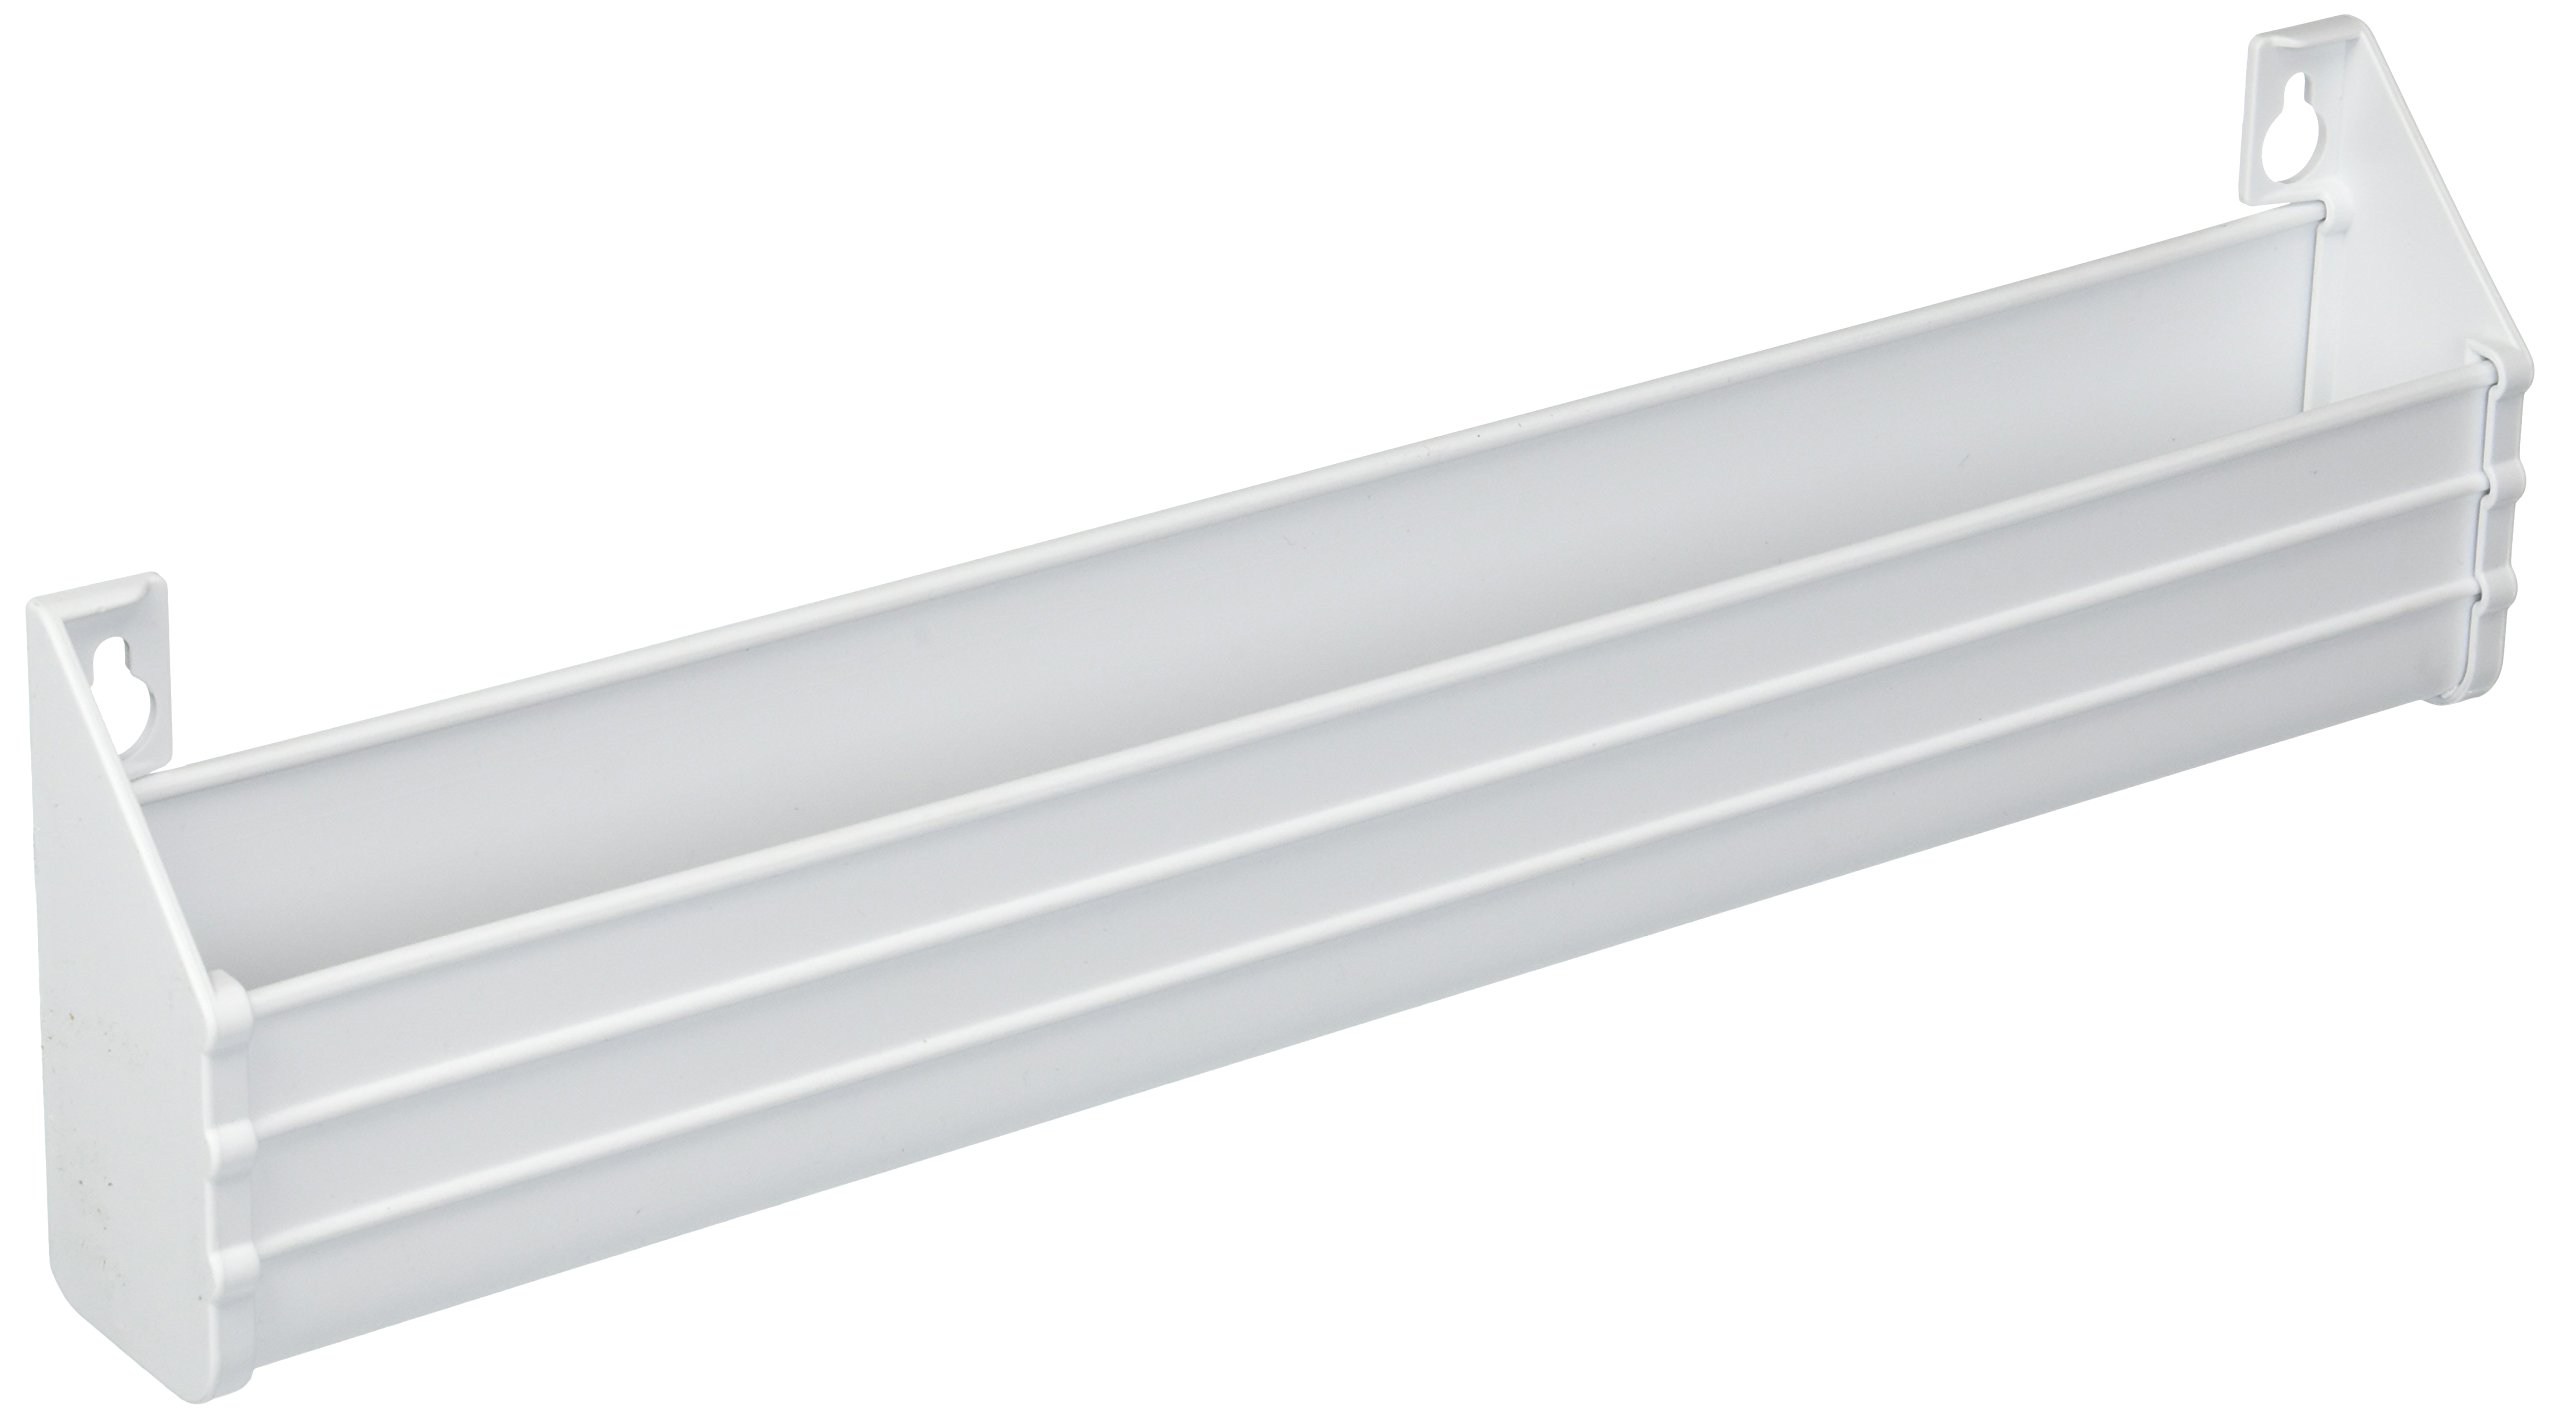 Rev-A-Shelf 14'' Slim Series Trays Sink Base Organizers, White